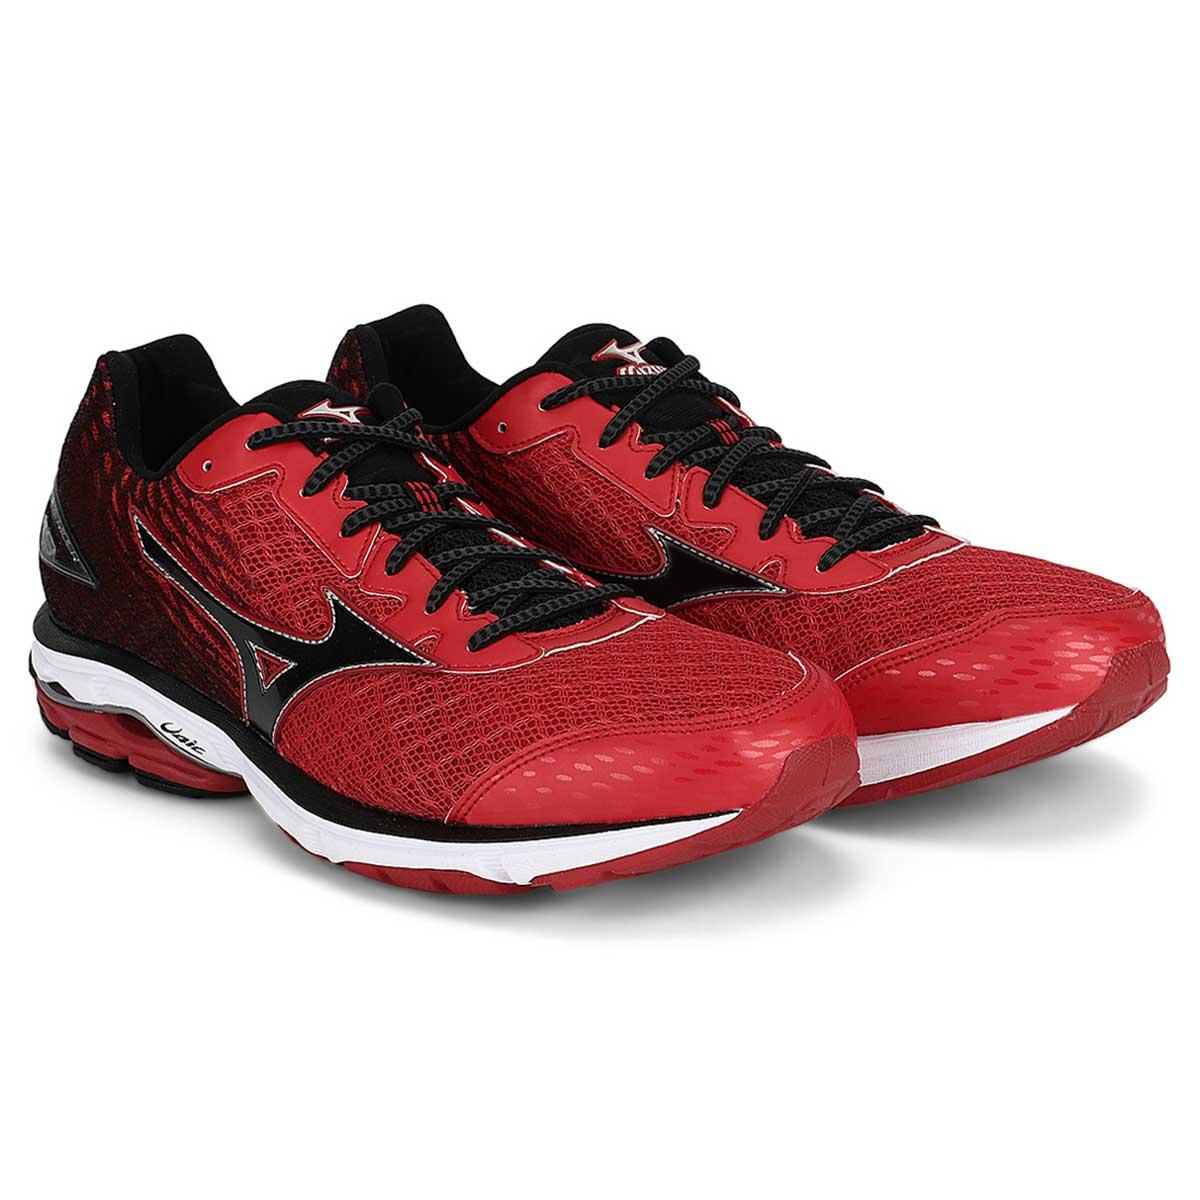 Buy Mizuno Wave Rider 19 Men Running Shoes Online India 3a1ec59081